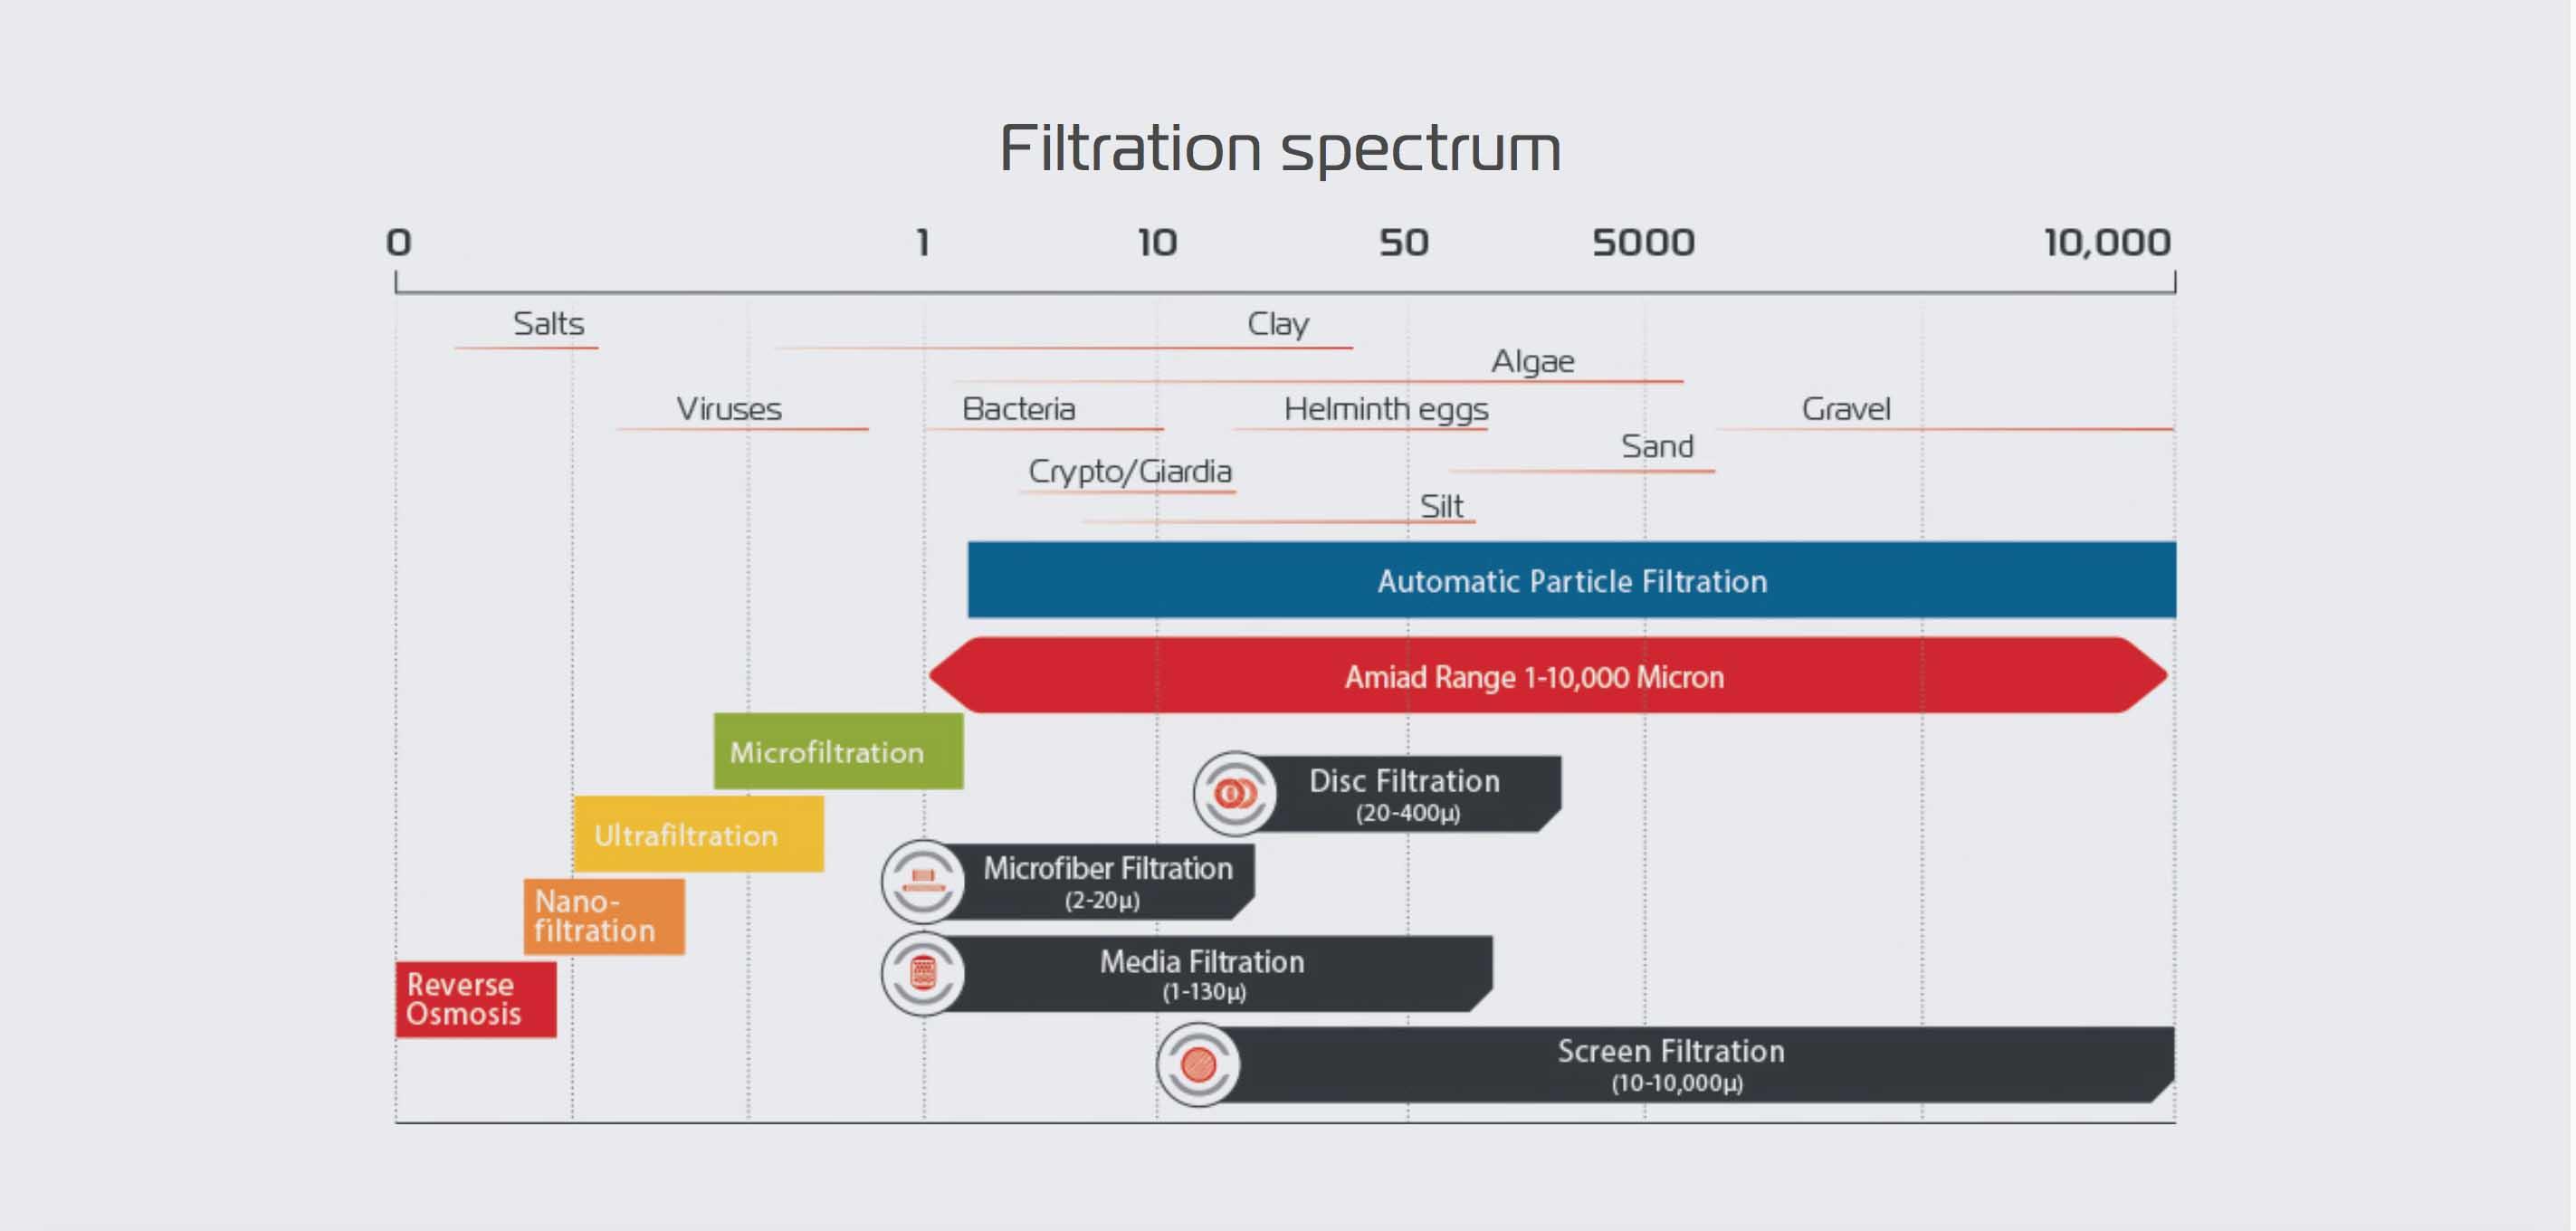 Filtratie spectrum Amiad Filters